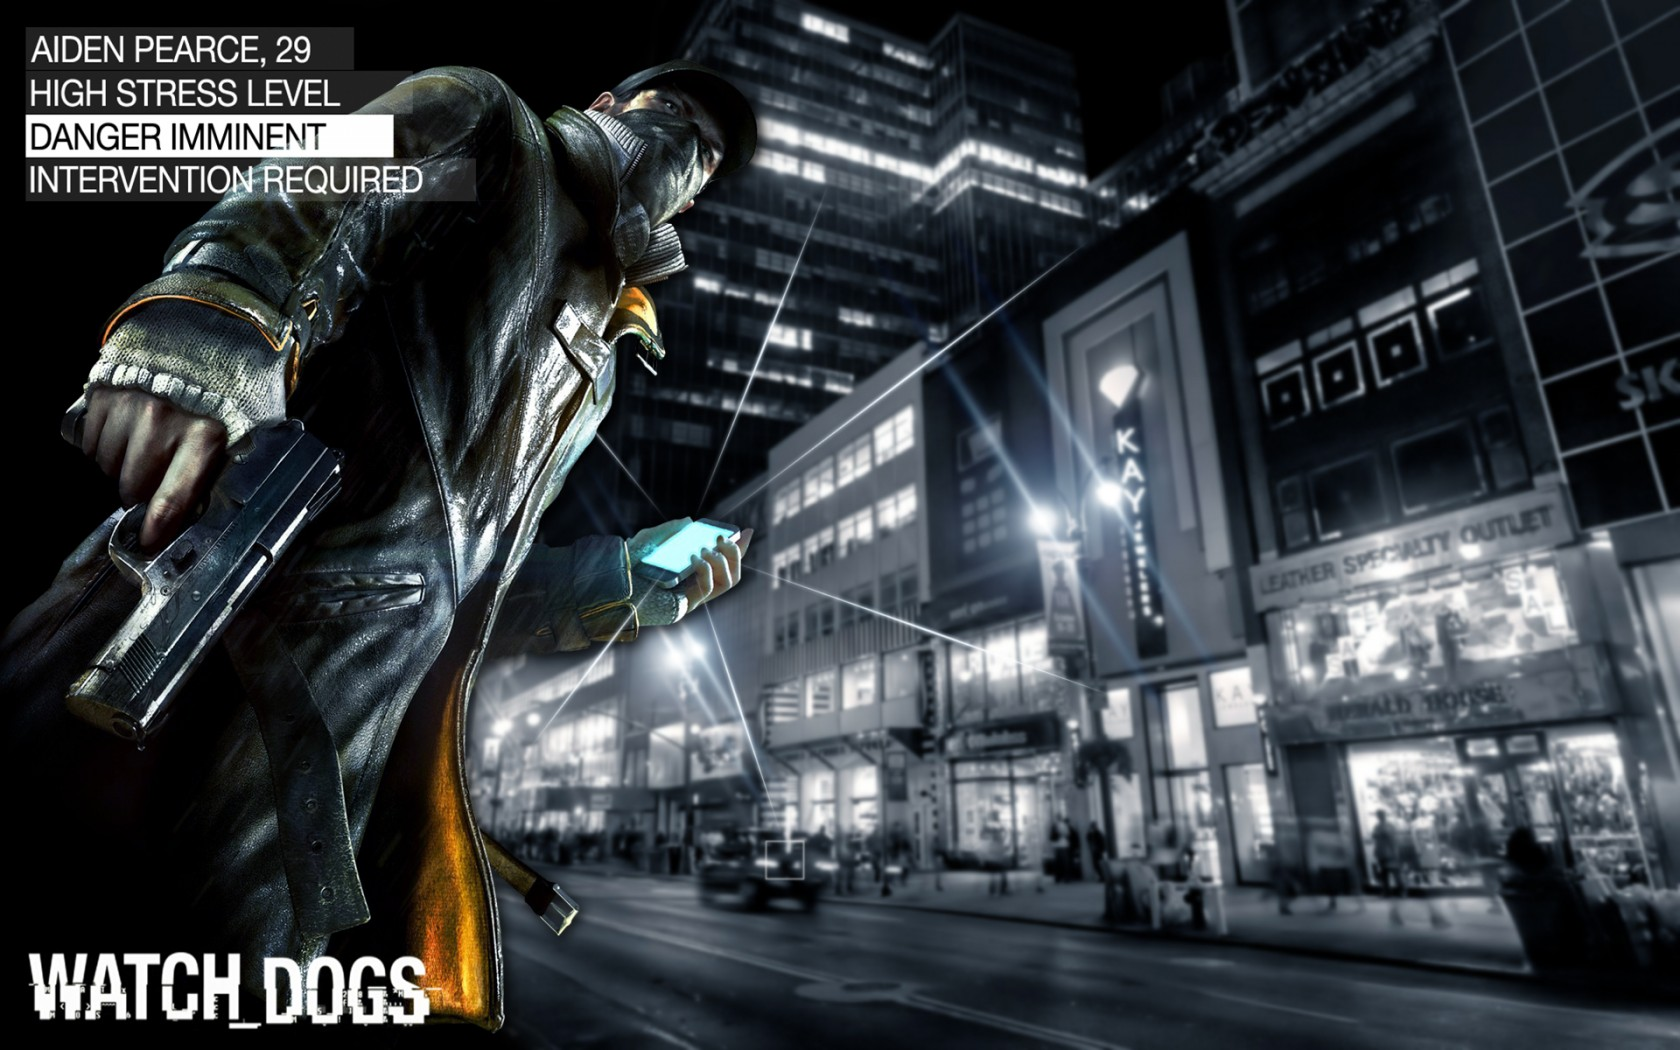 Галерея - 484206-1680x1050 - Официальный фан-сайт Watch Dogs ...